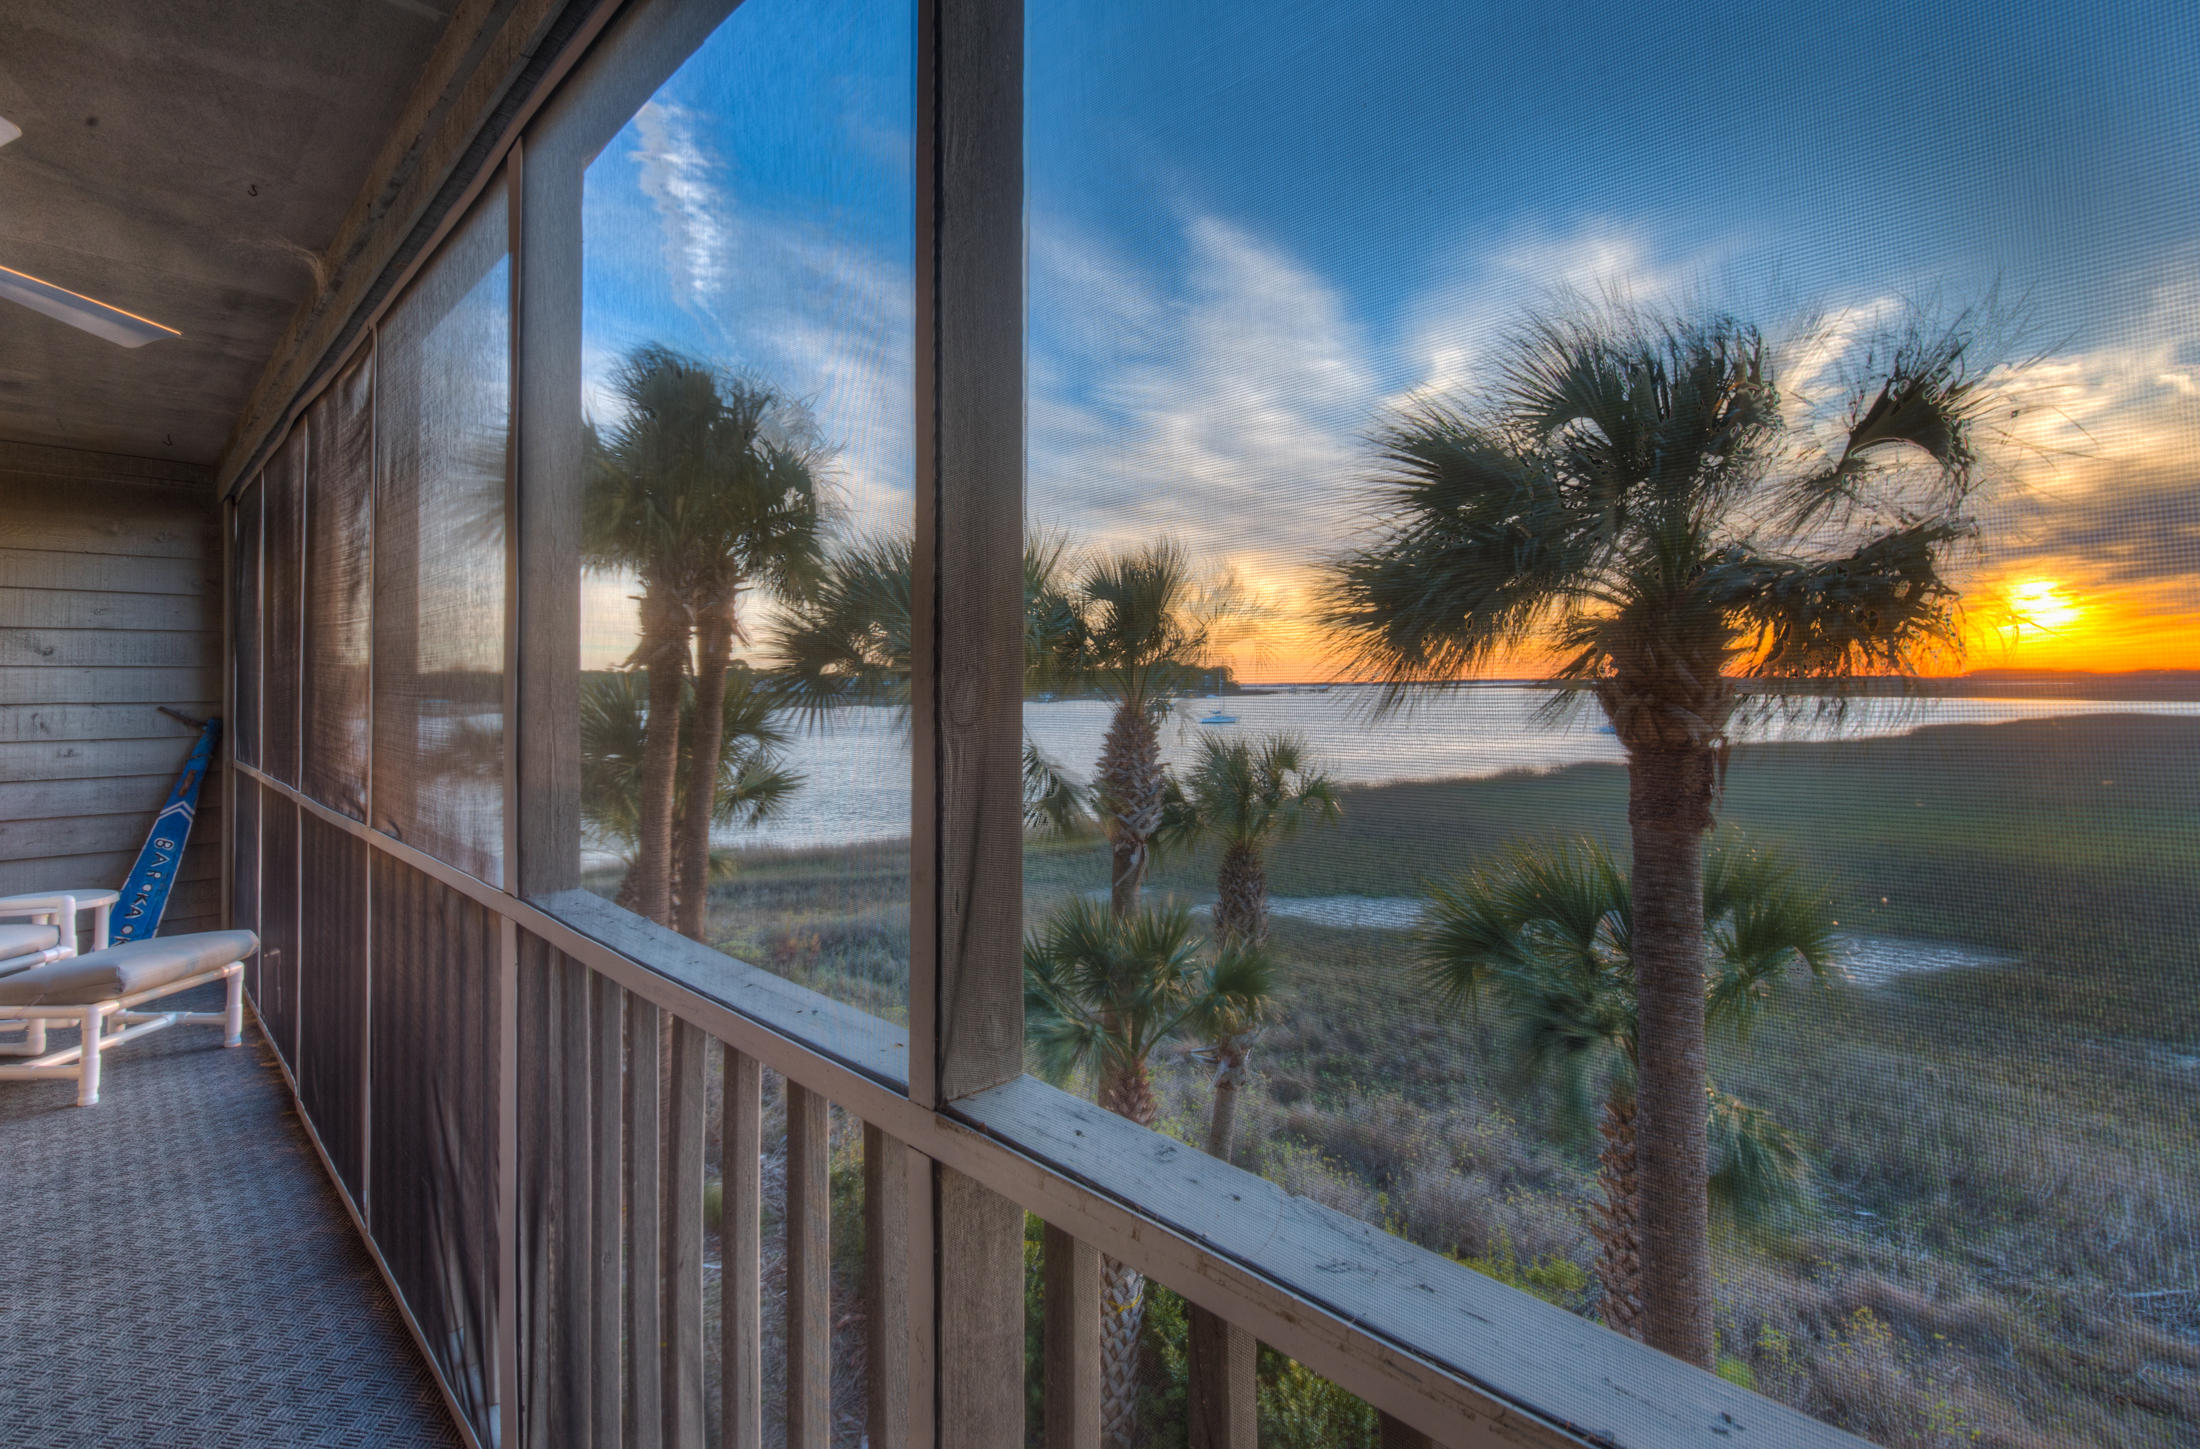 MLS# 17003467 | 101 W Mariners Cay Drive Folly Beach SC | Mariners Cay  subdivision